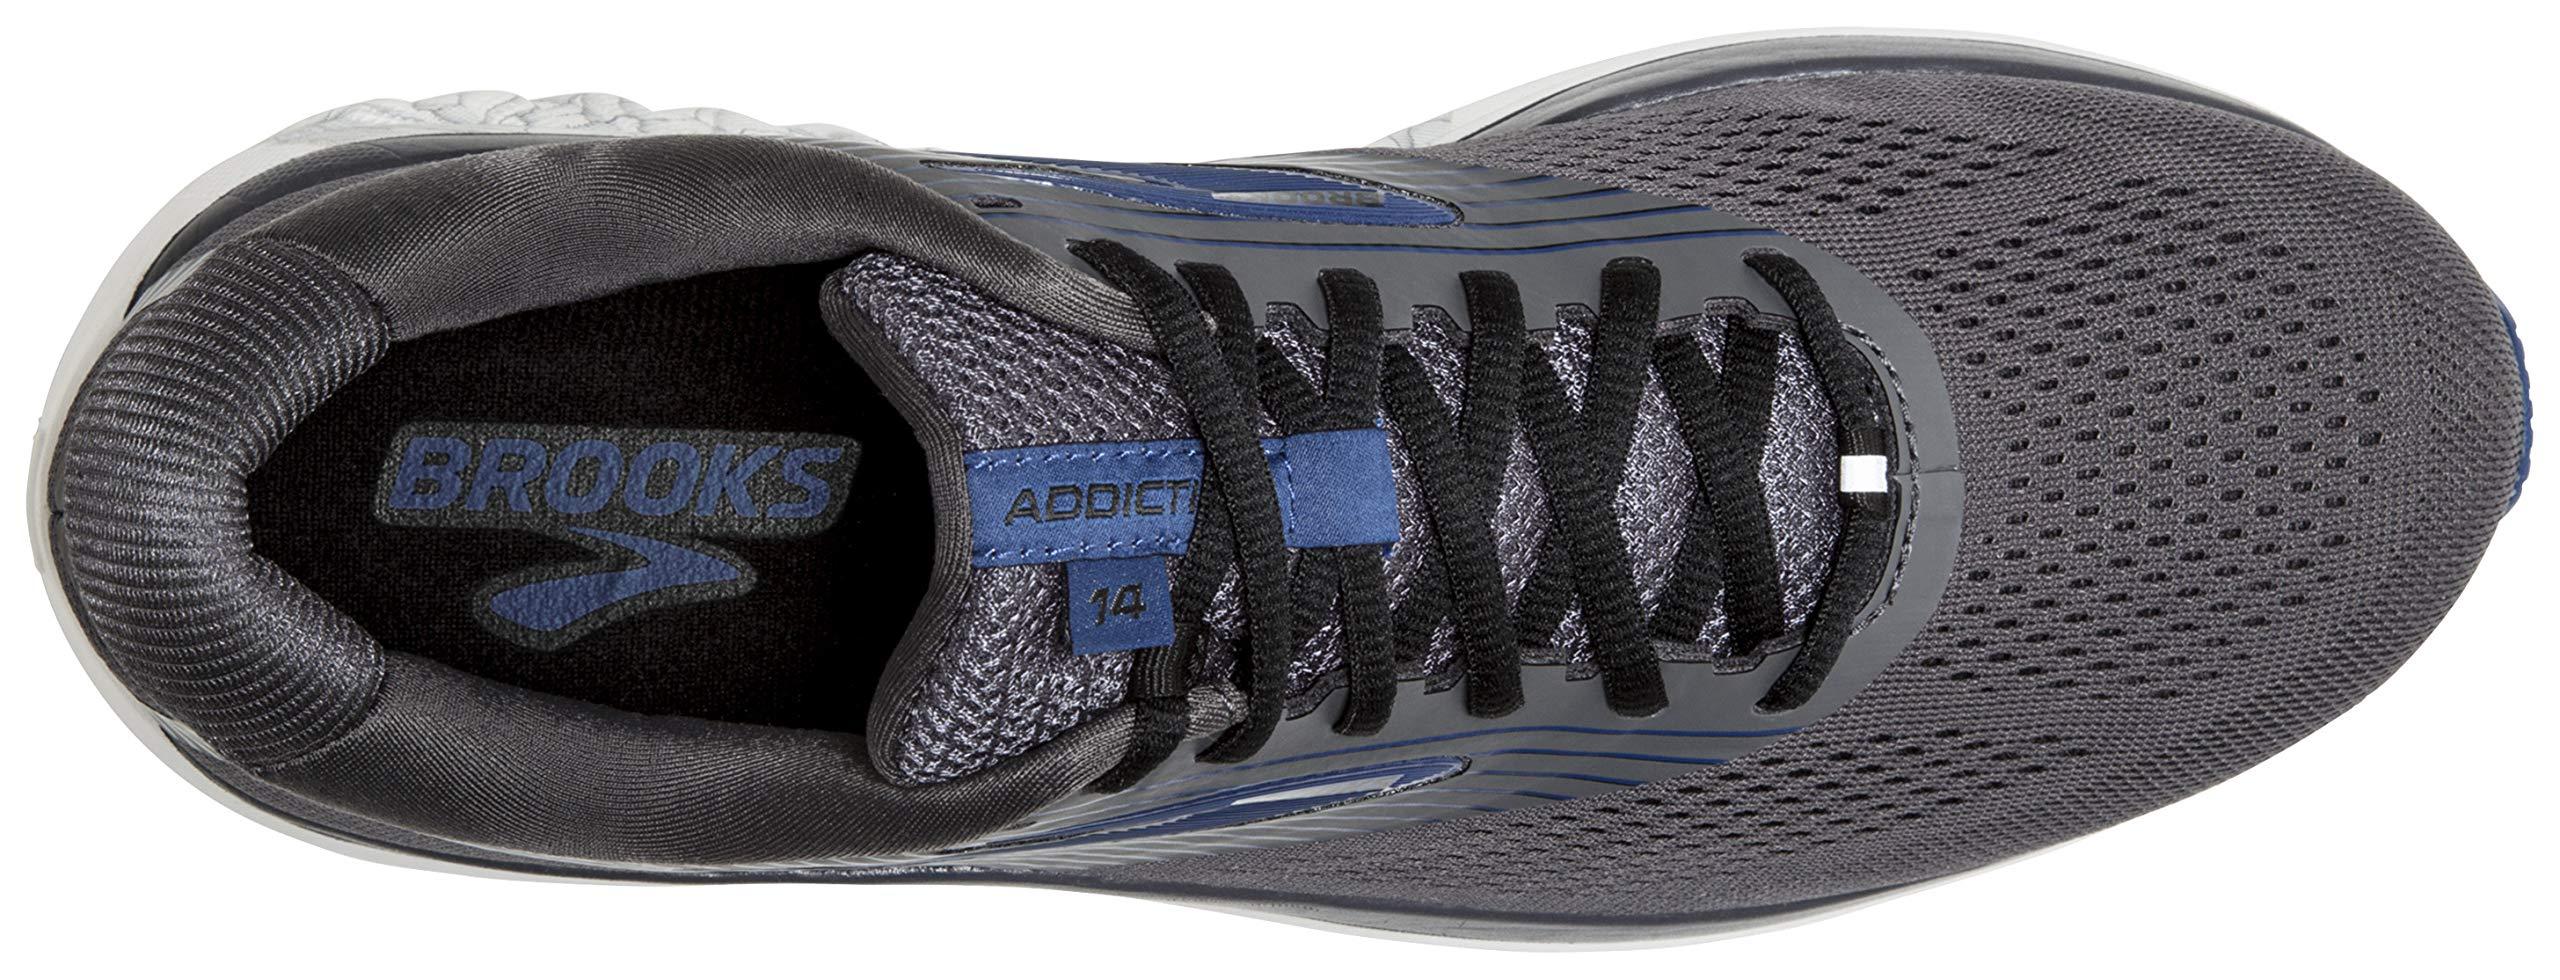 Brooks Men's Addiction 14 Running Shoes